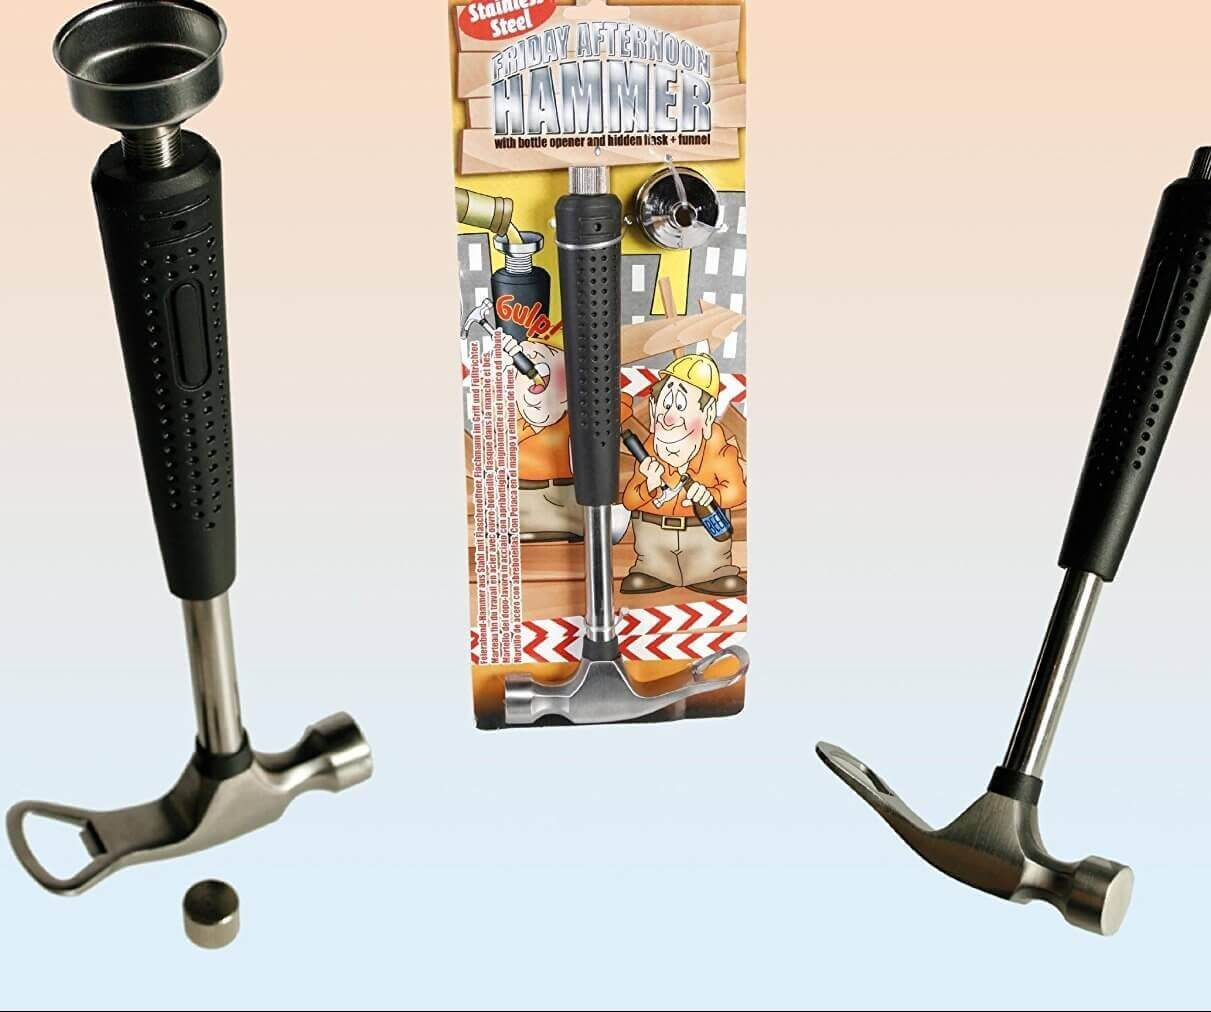 Flachmann-Hammer